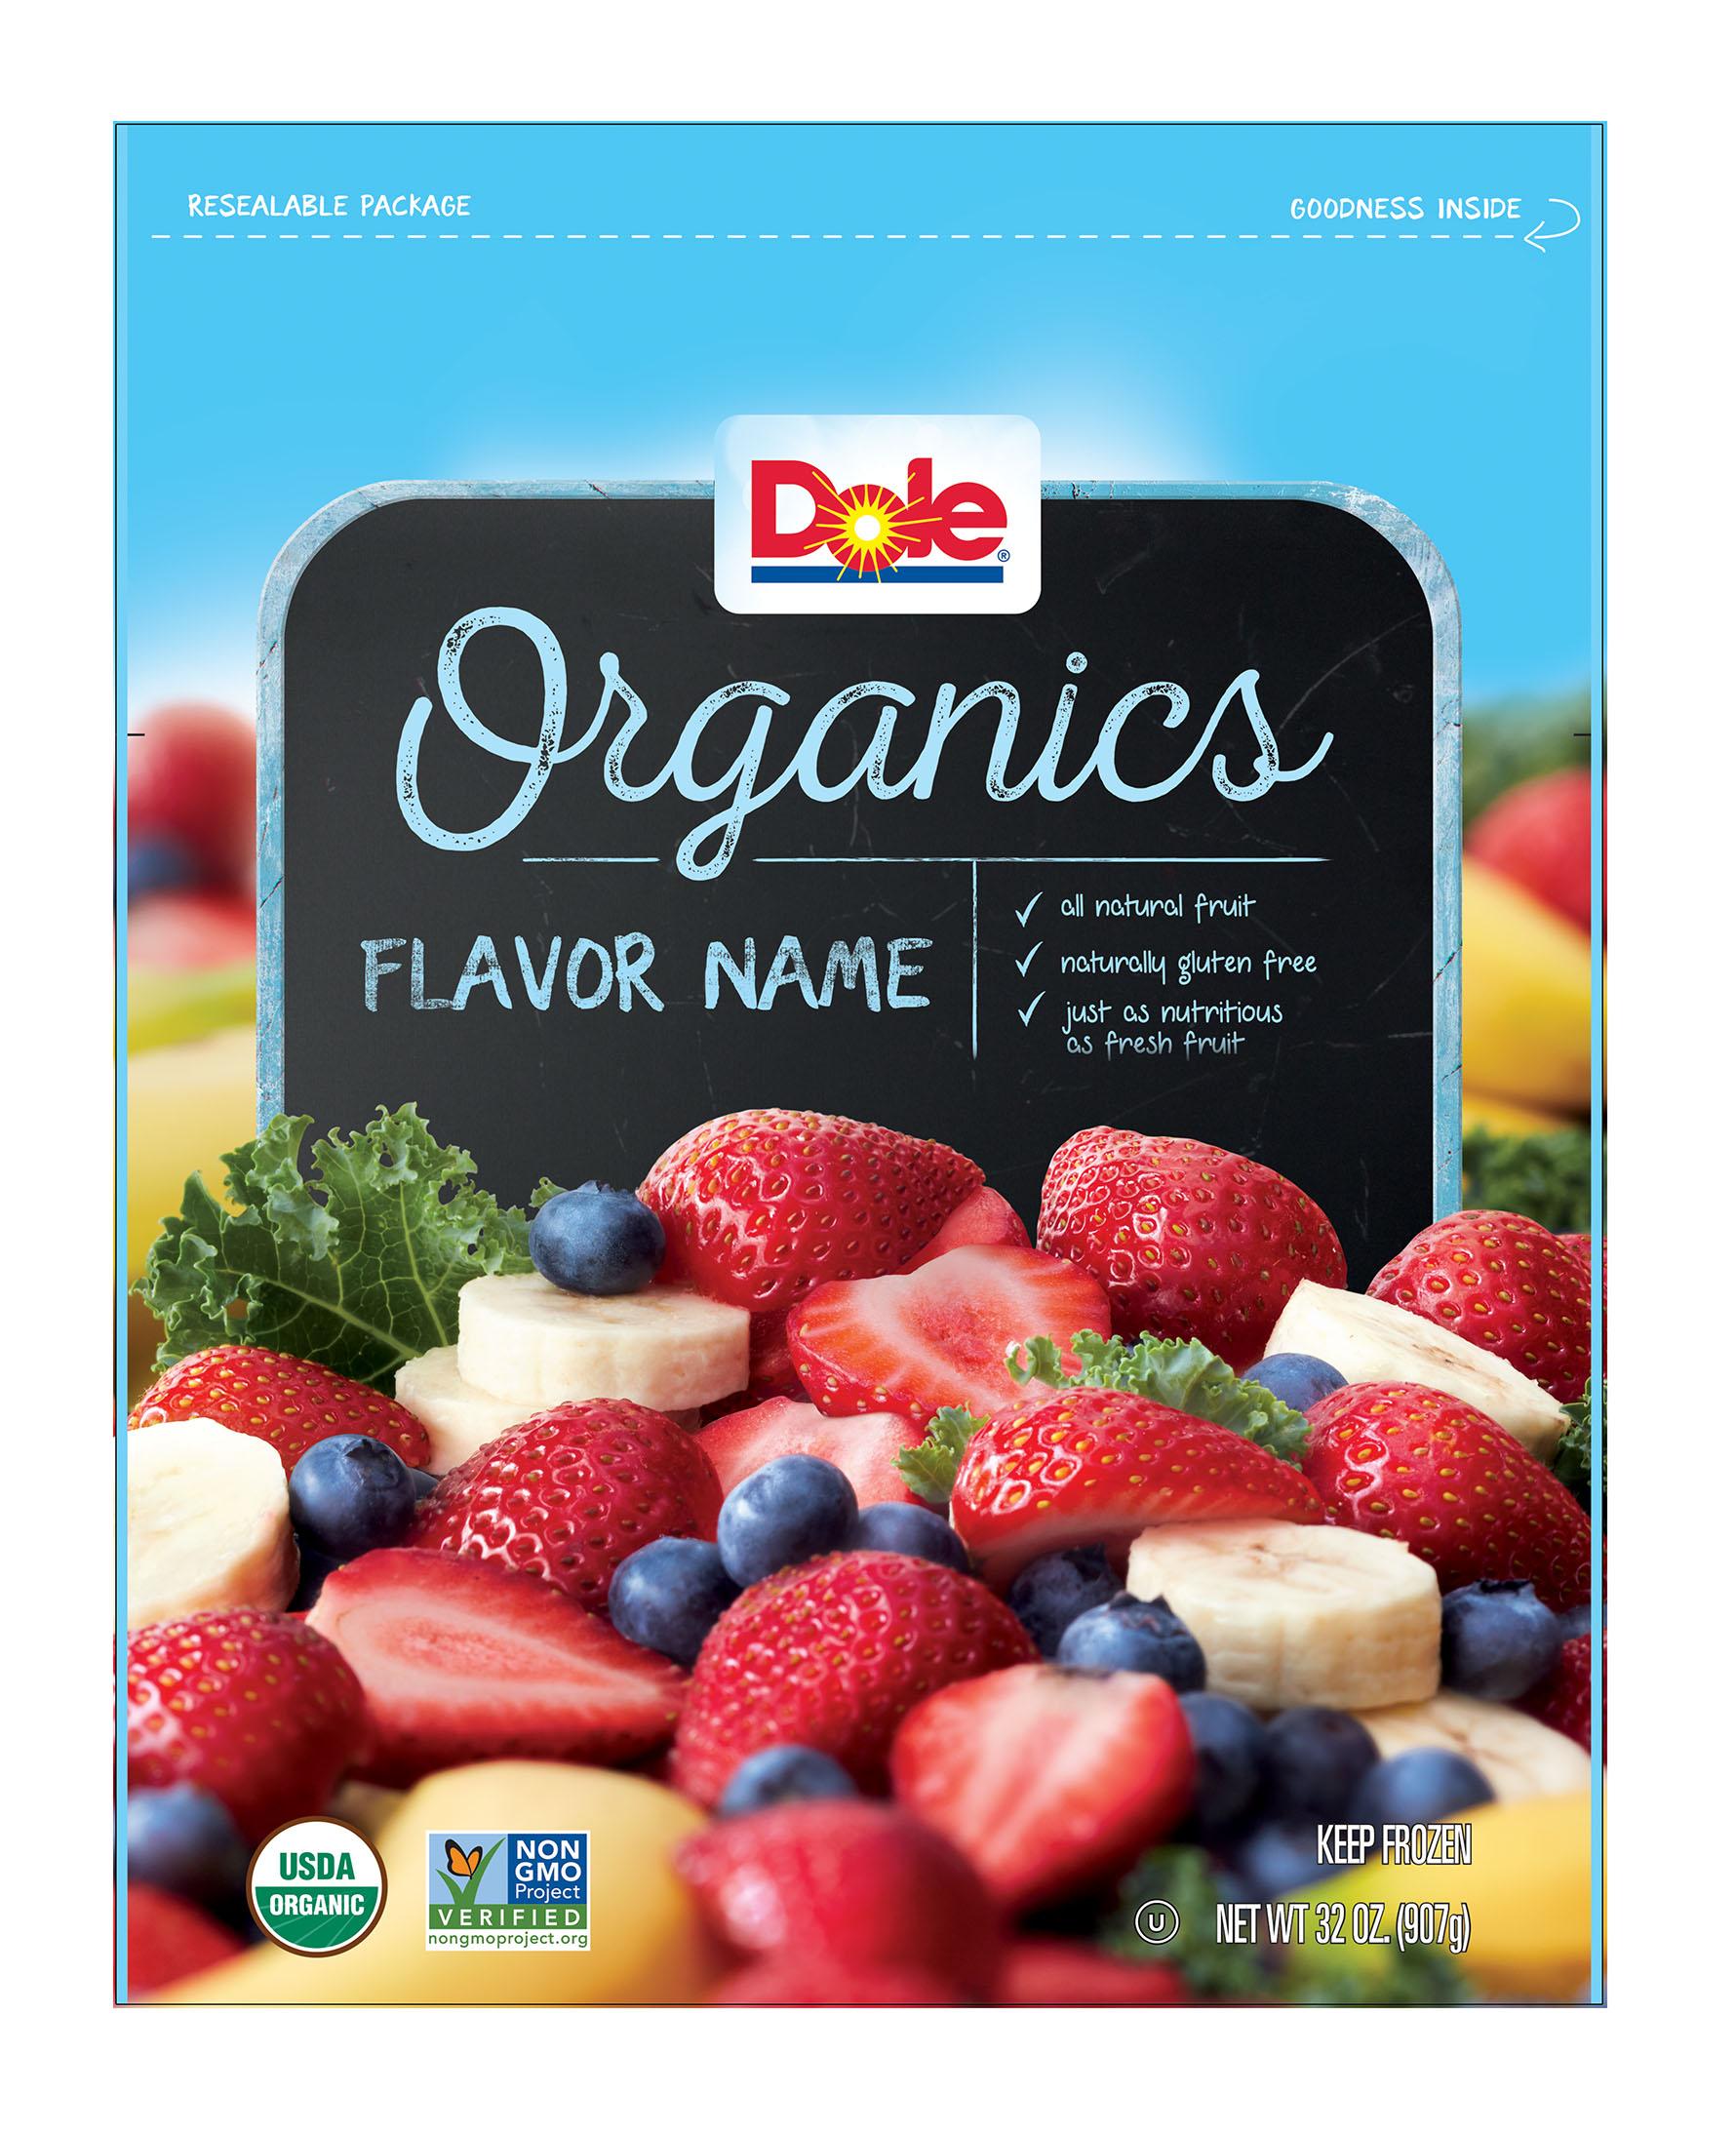 Organic Berries and Kale 32 oz CMYK Version 2 FPO 1.jpg